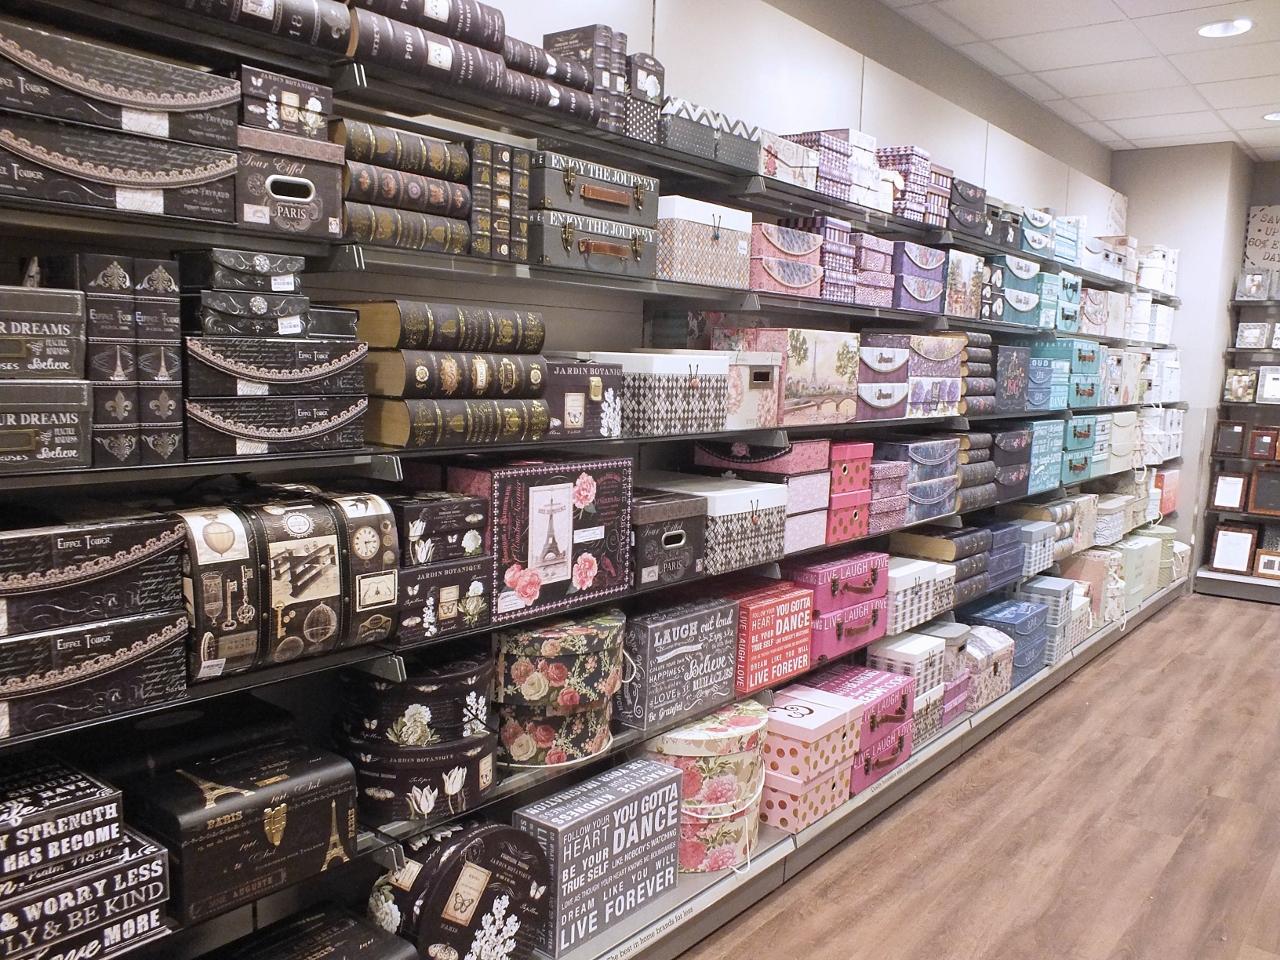 homesense haul in new cheadle store don t cramp my style